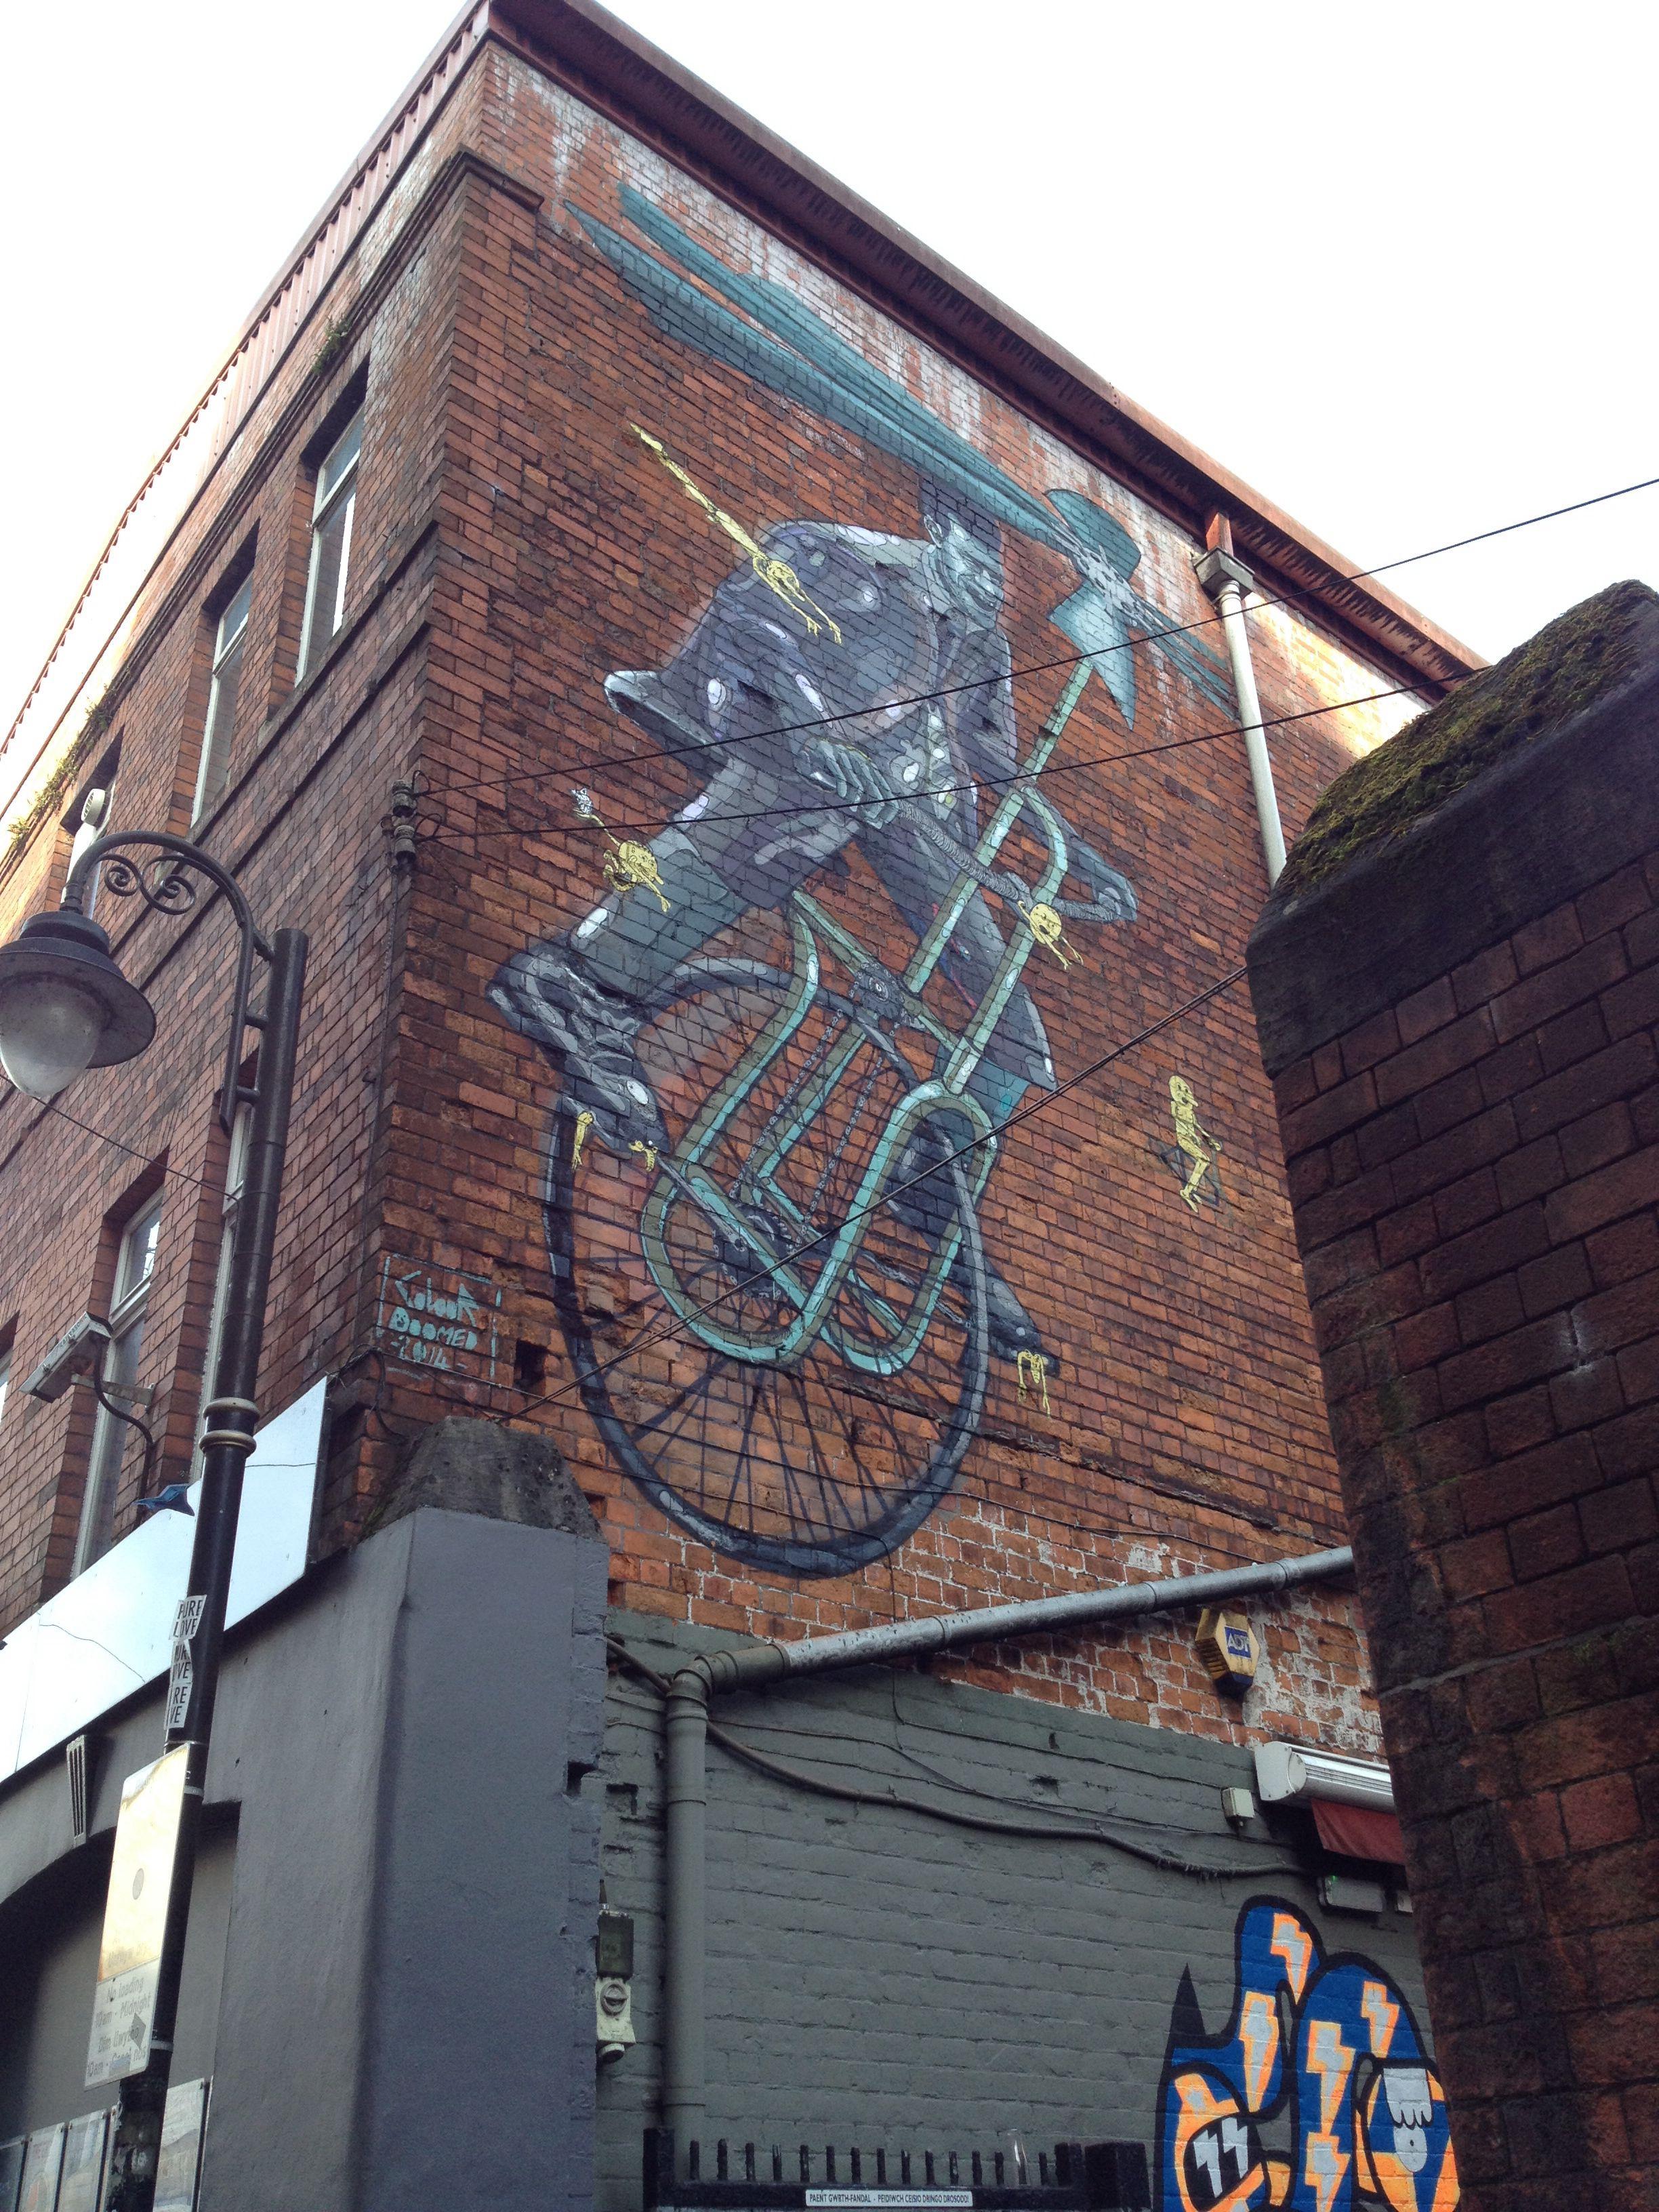 graffiti in cardiff  graffiti street art art